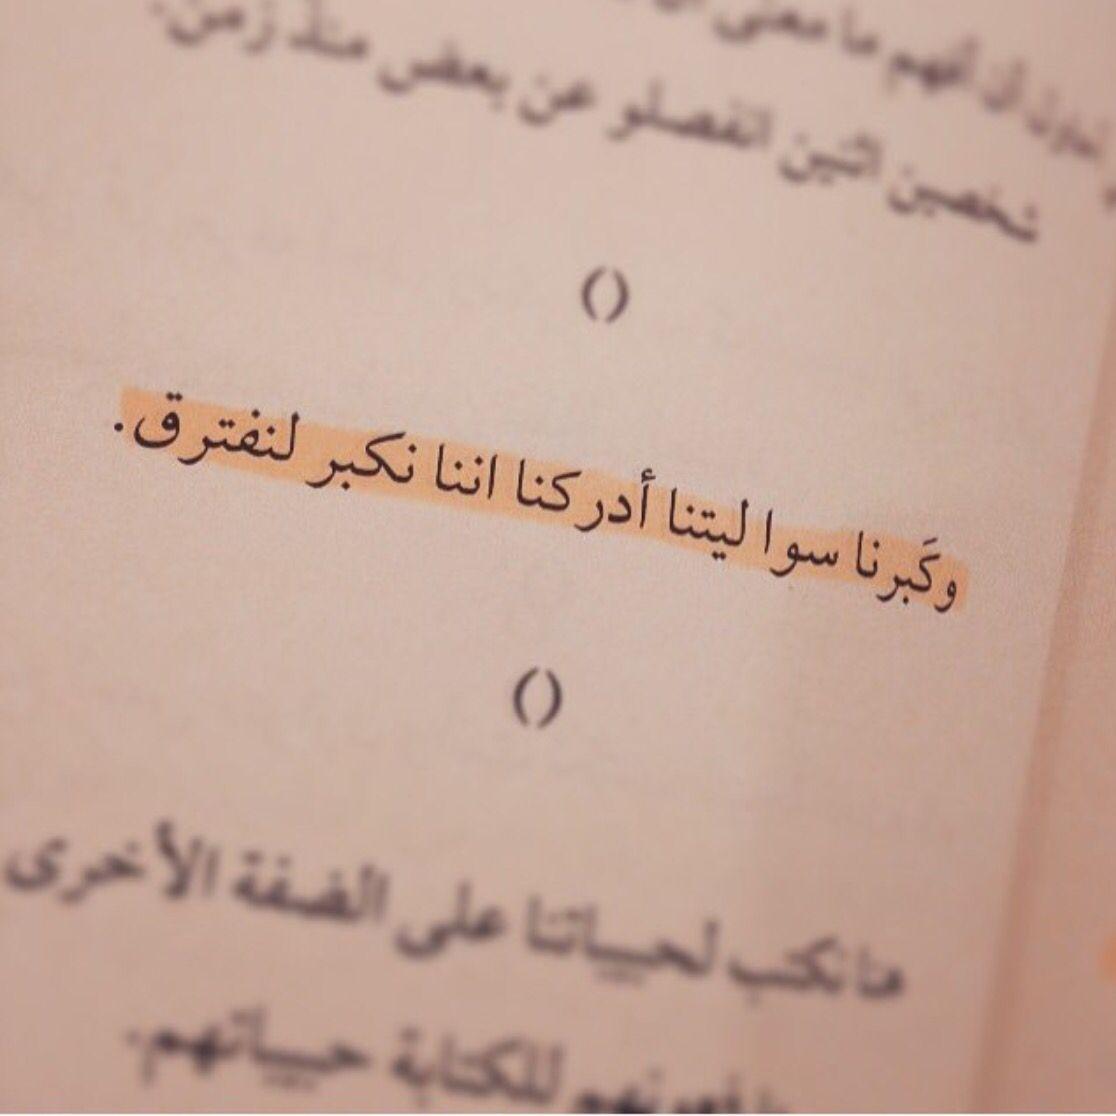 لو كنا نعلم ما كبرنا Arabic Quotes Quotes My Love